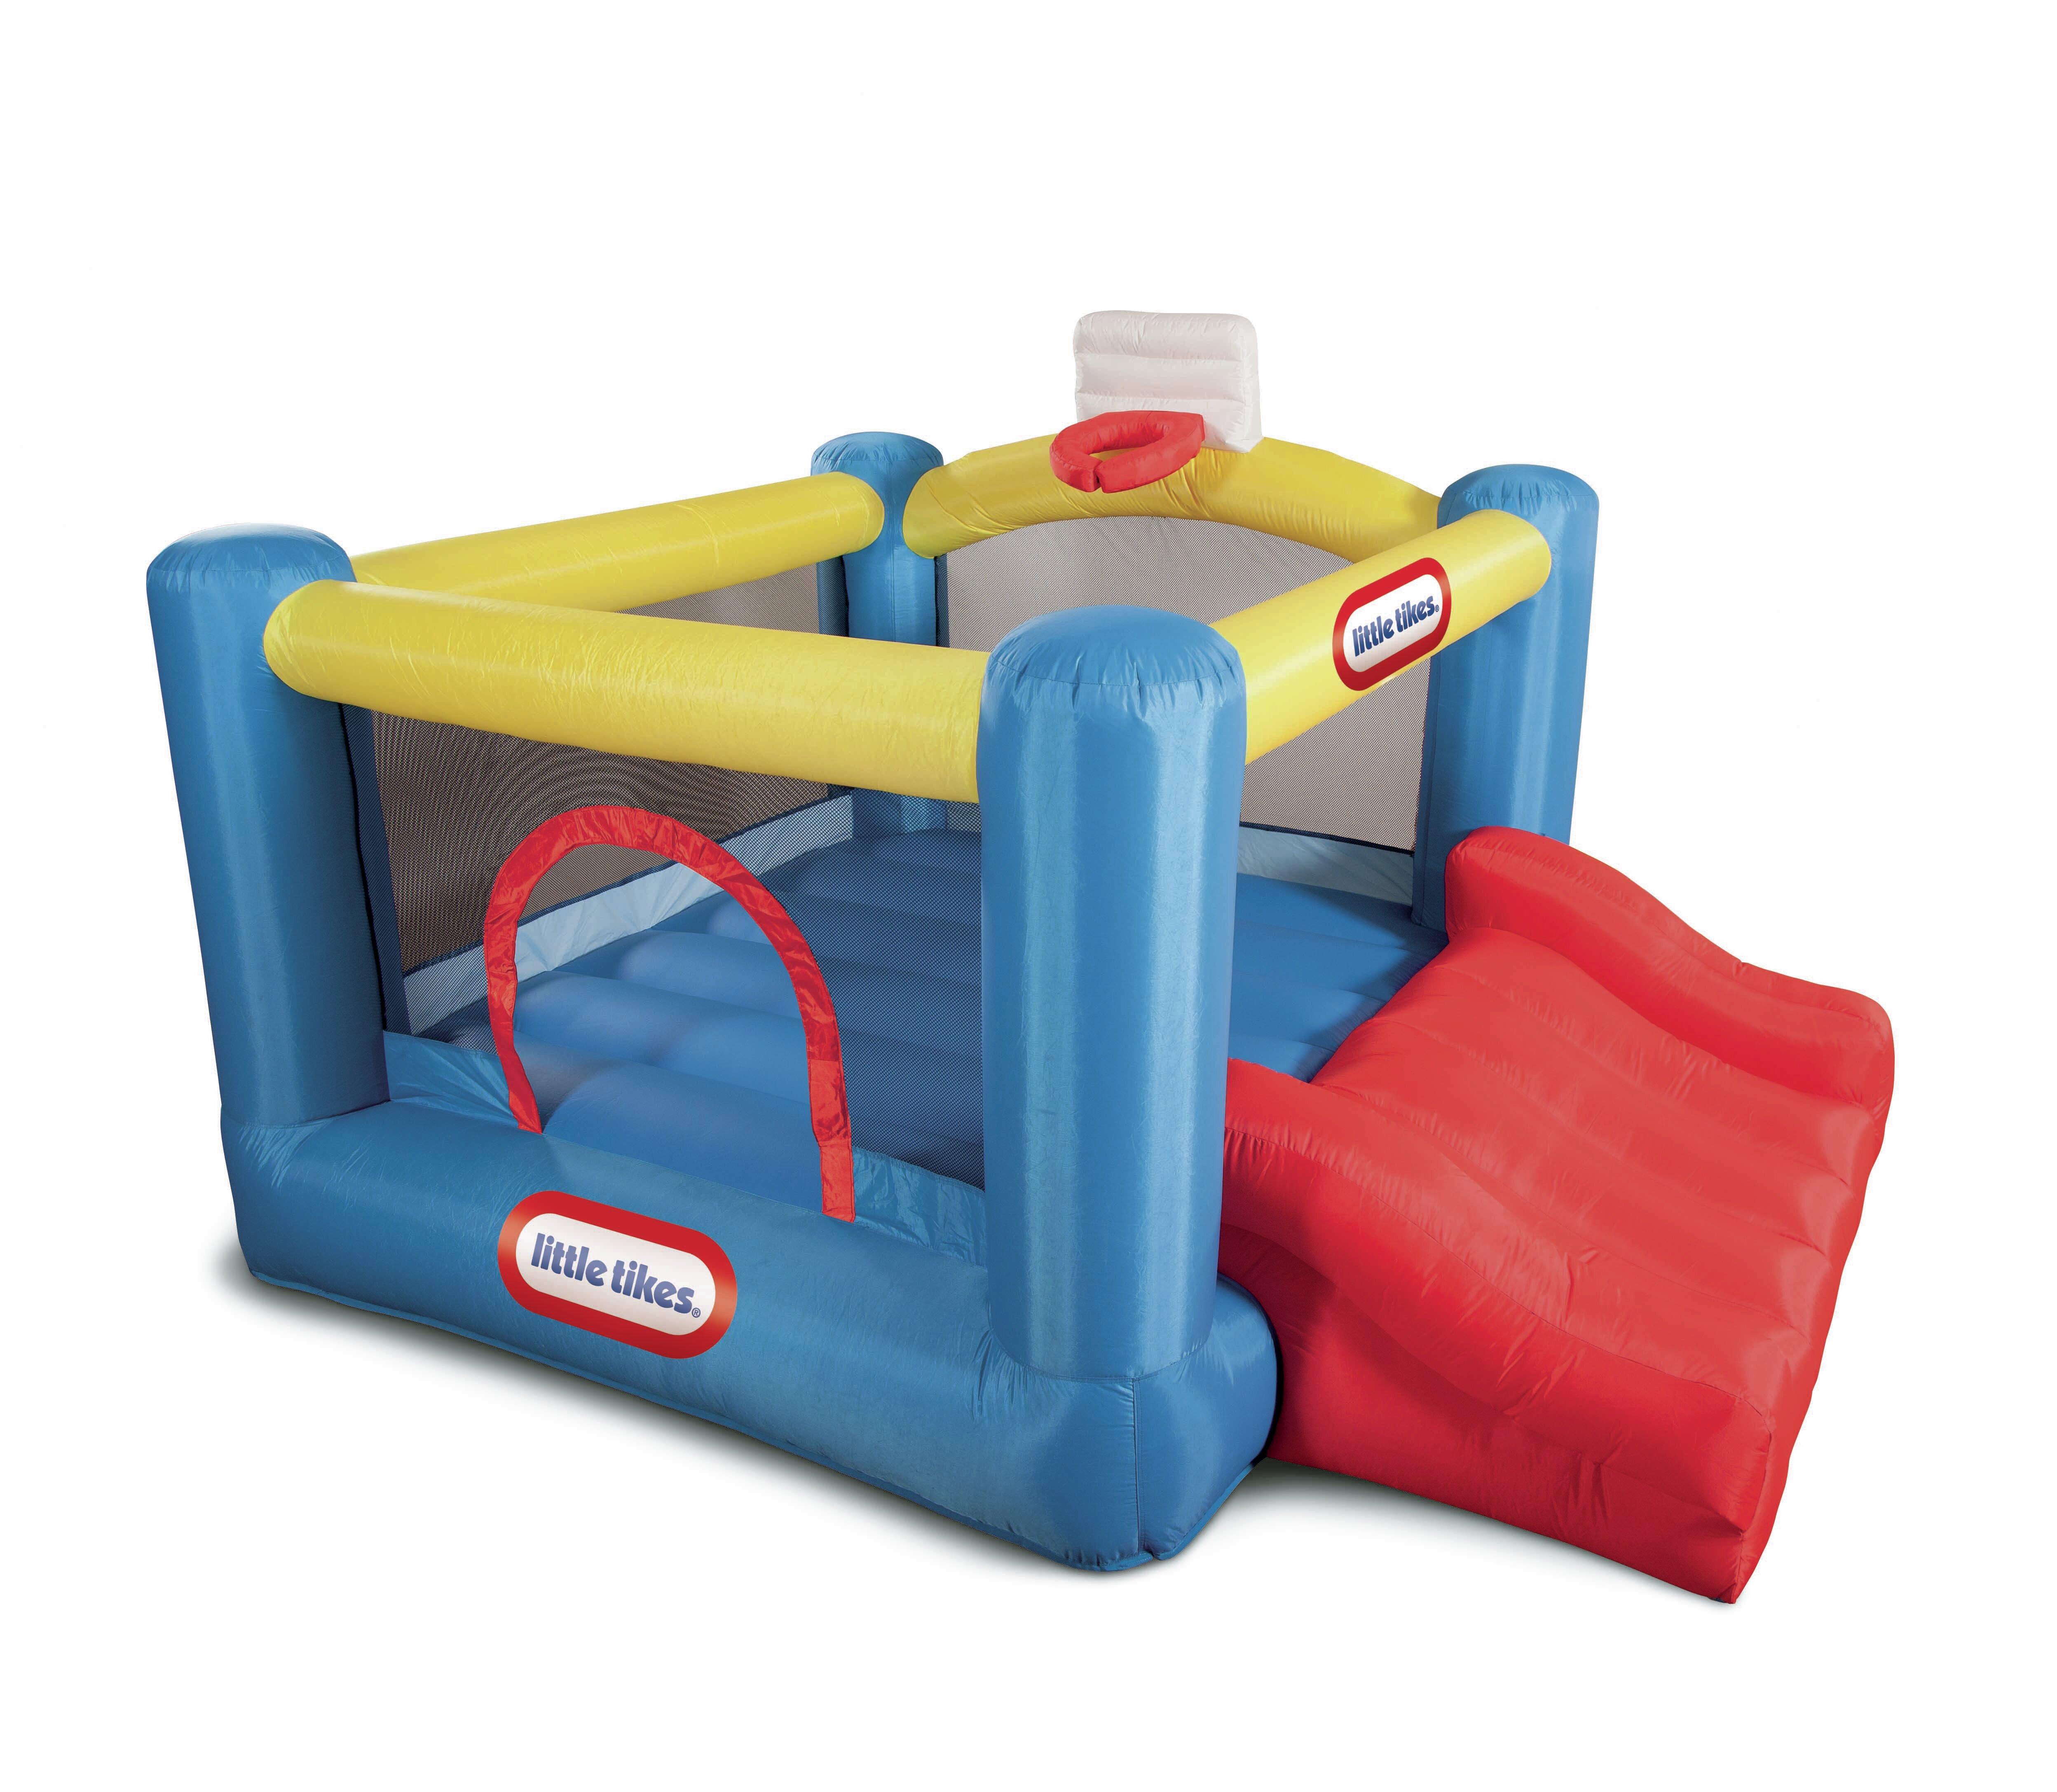 Little Tikes Jr. Sports \'n Slide Bounce House & Reviews | Wayfair